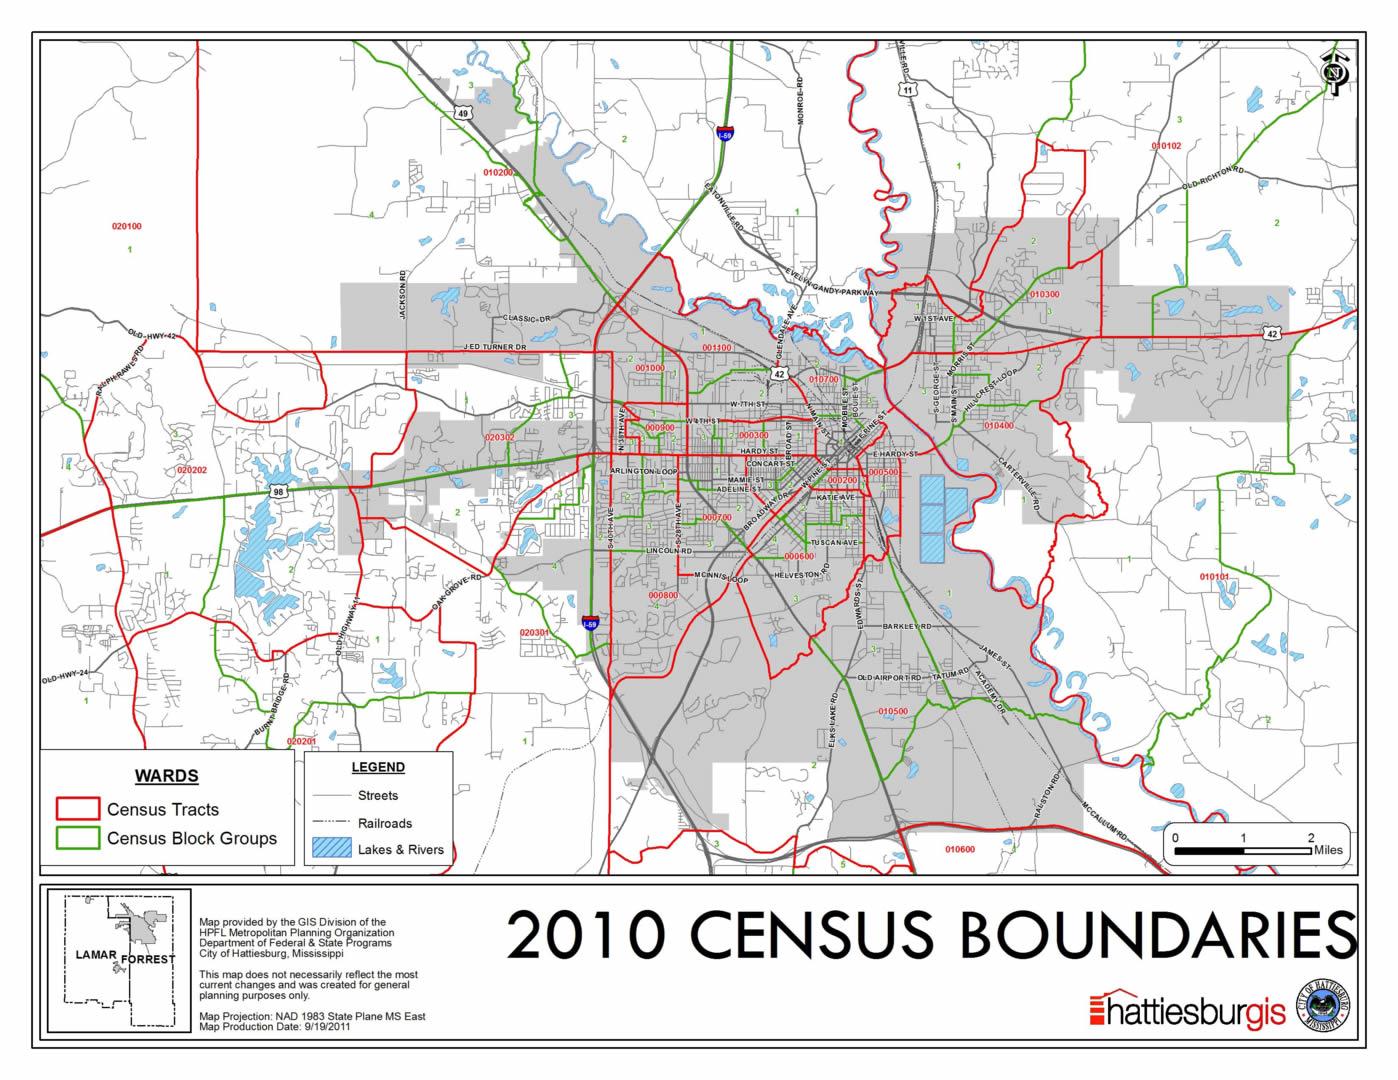 North charleston south carolina city information epodunk -  Gis And Mapping City Of Hattiesburg